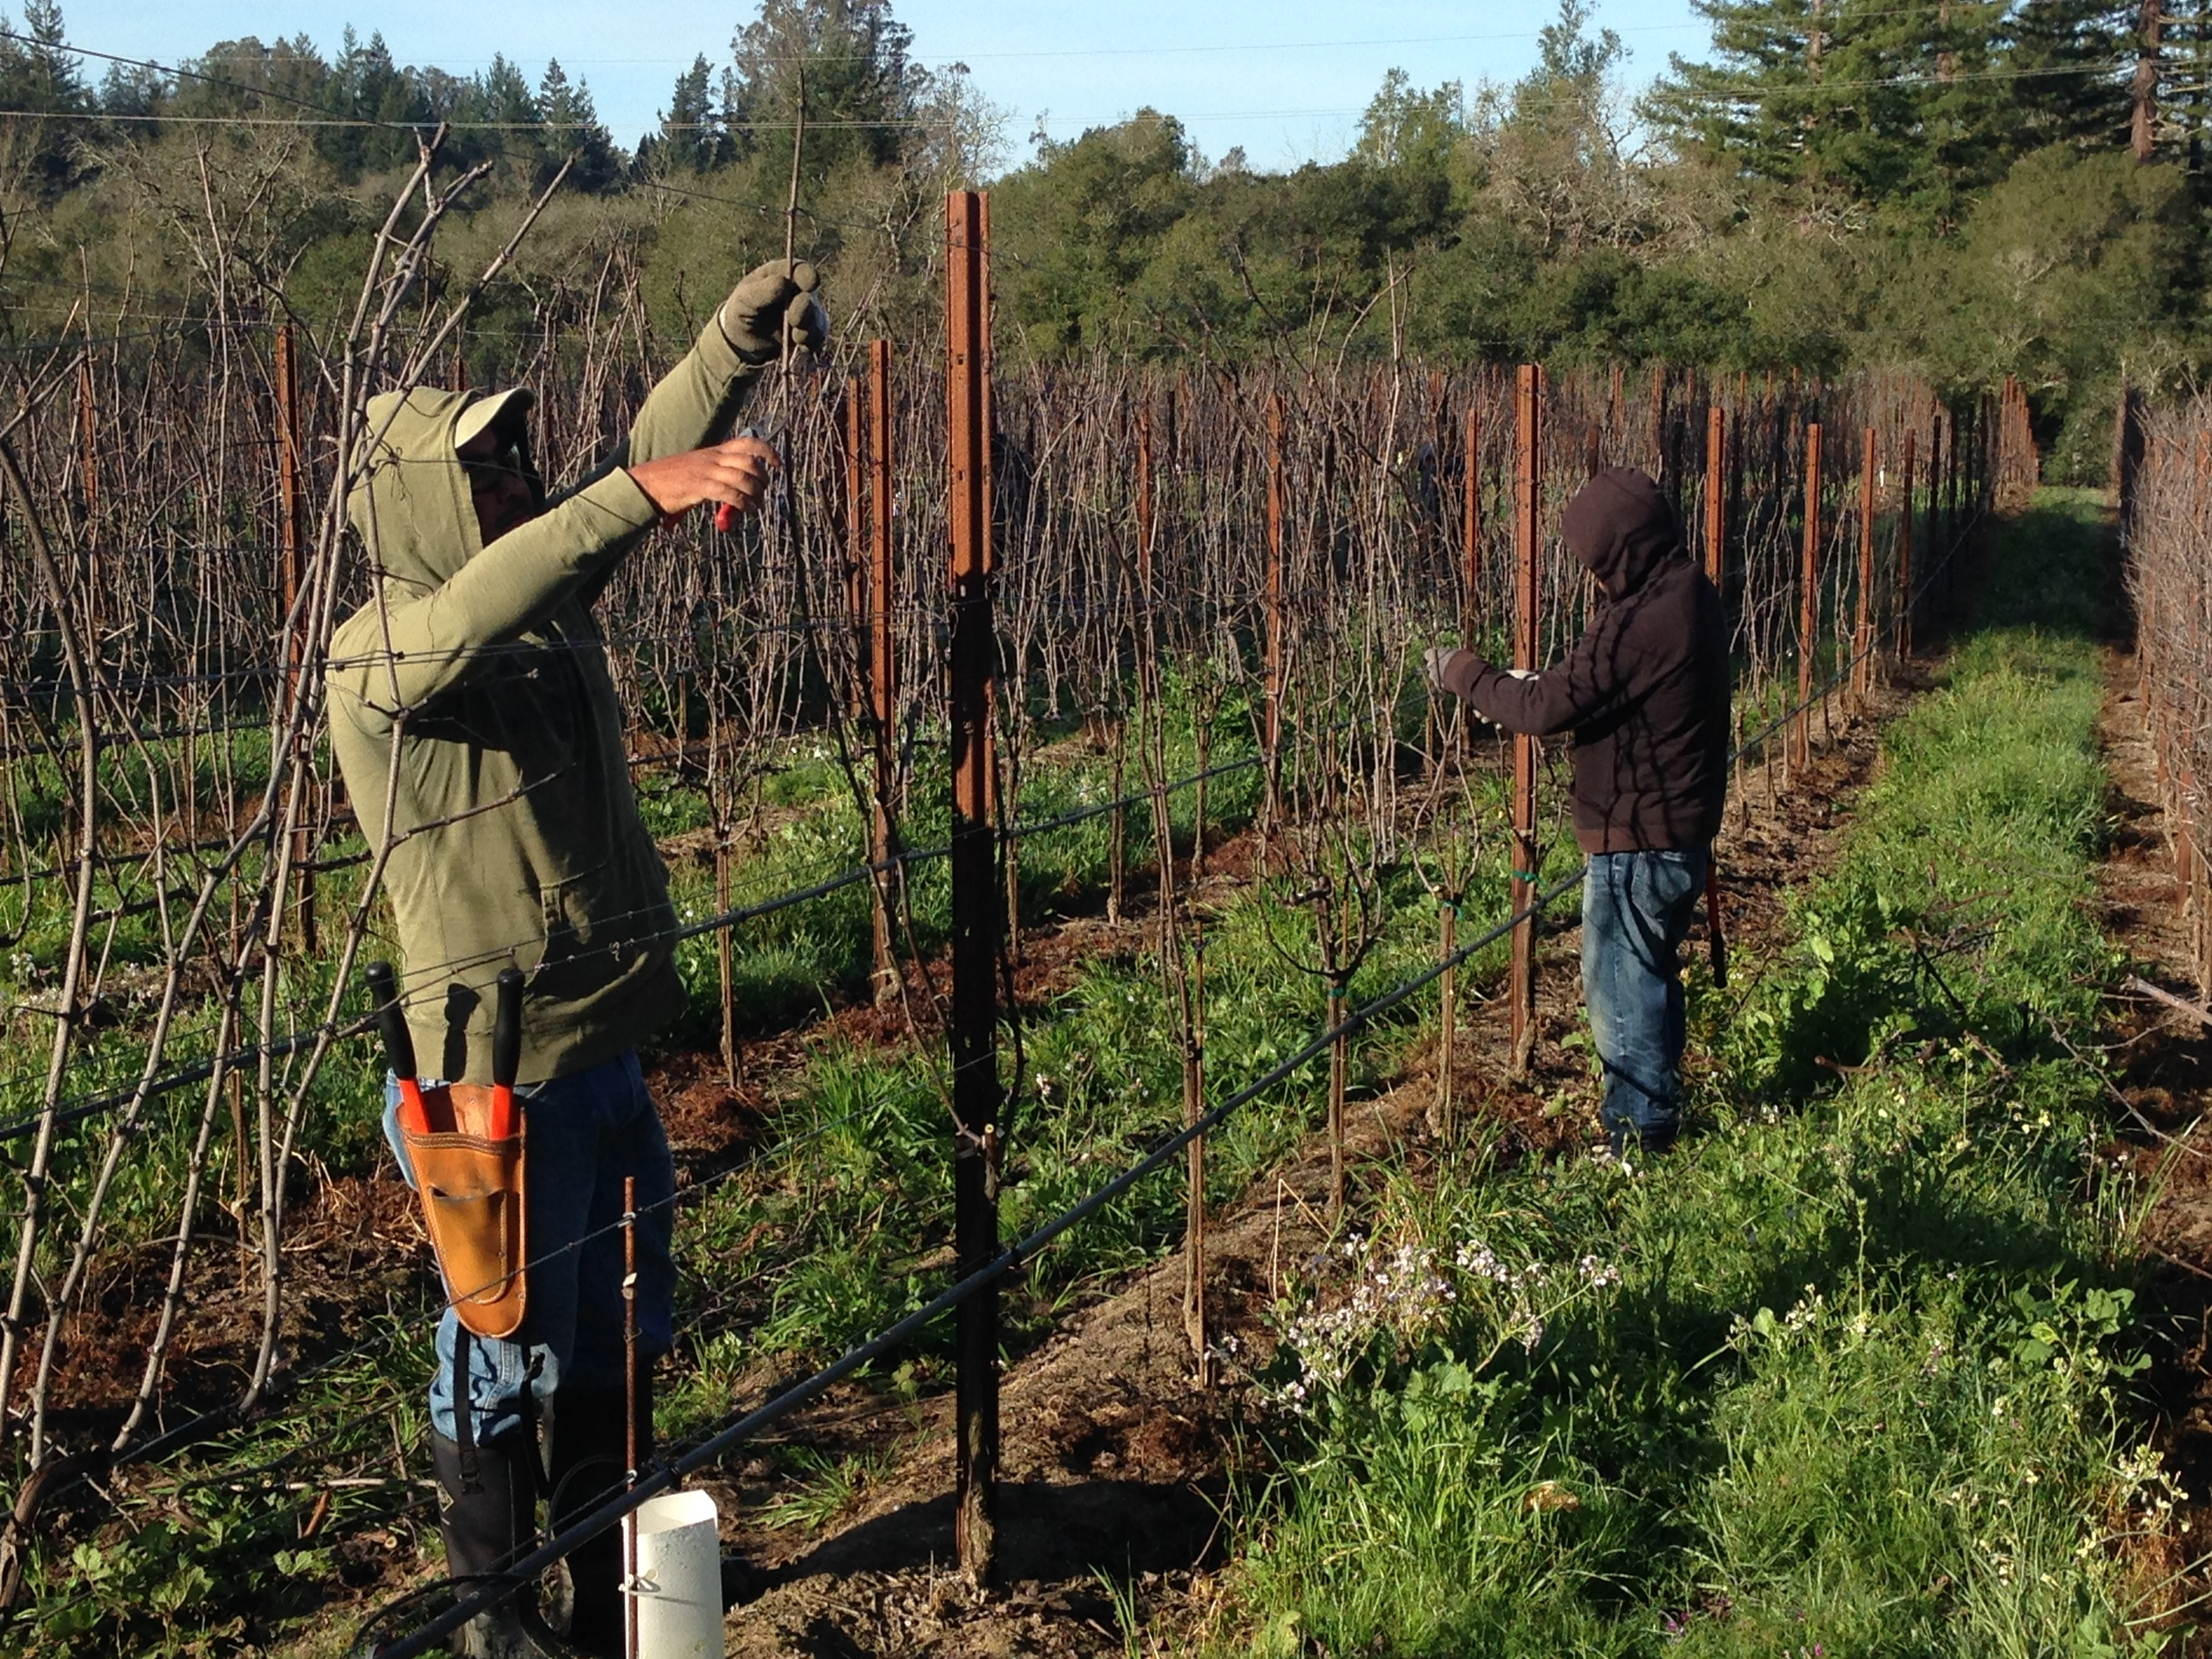 Jim's crew from Cornerstone Certified Vineyard hard at work two weeks ago pruning GFV vines.